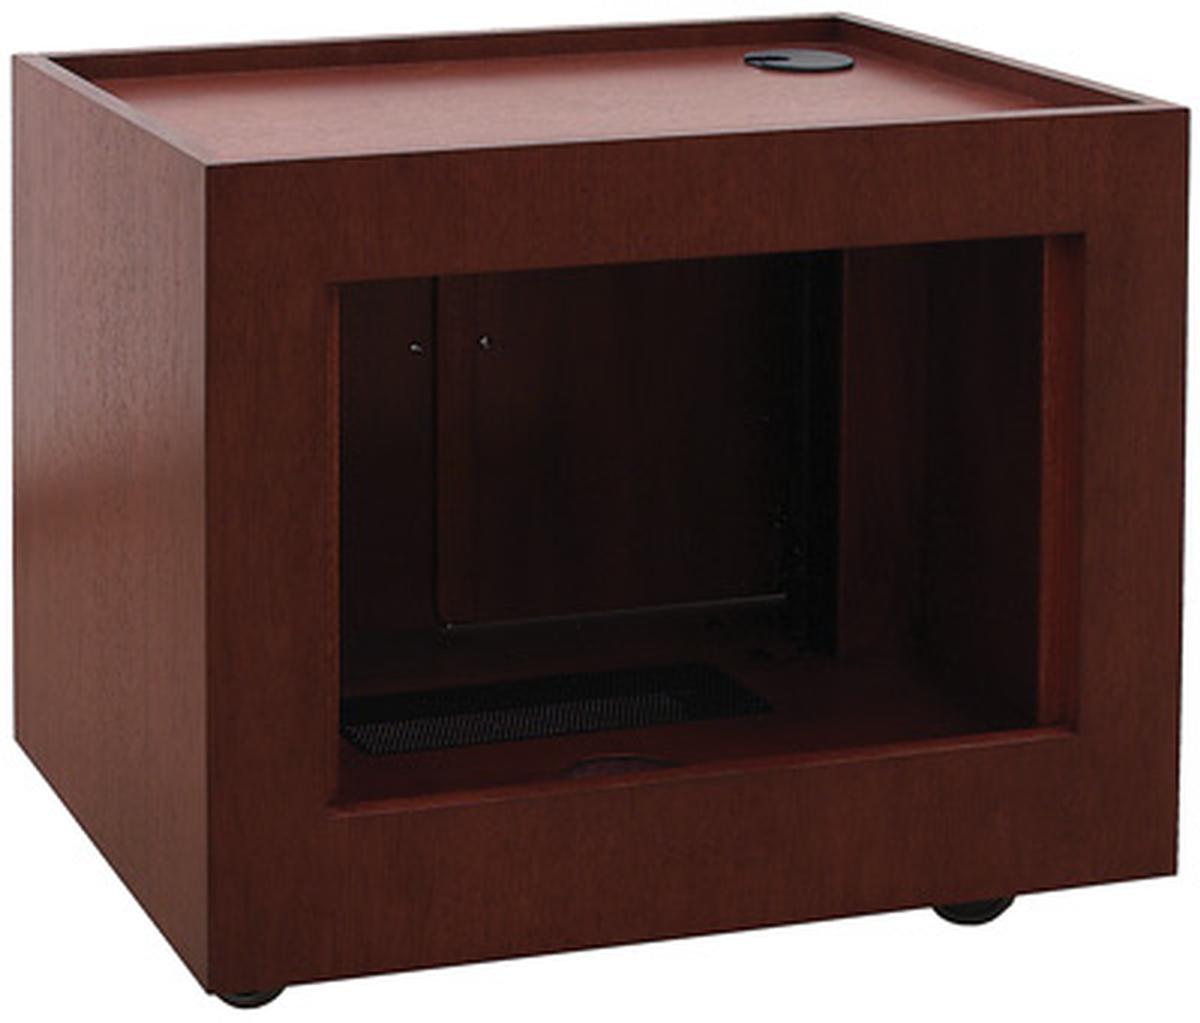 Mrcs 20p Marshall Furniture Mobile Rack Cabinet